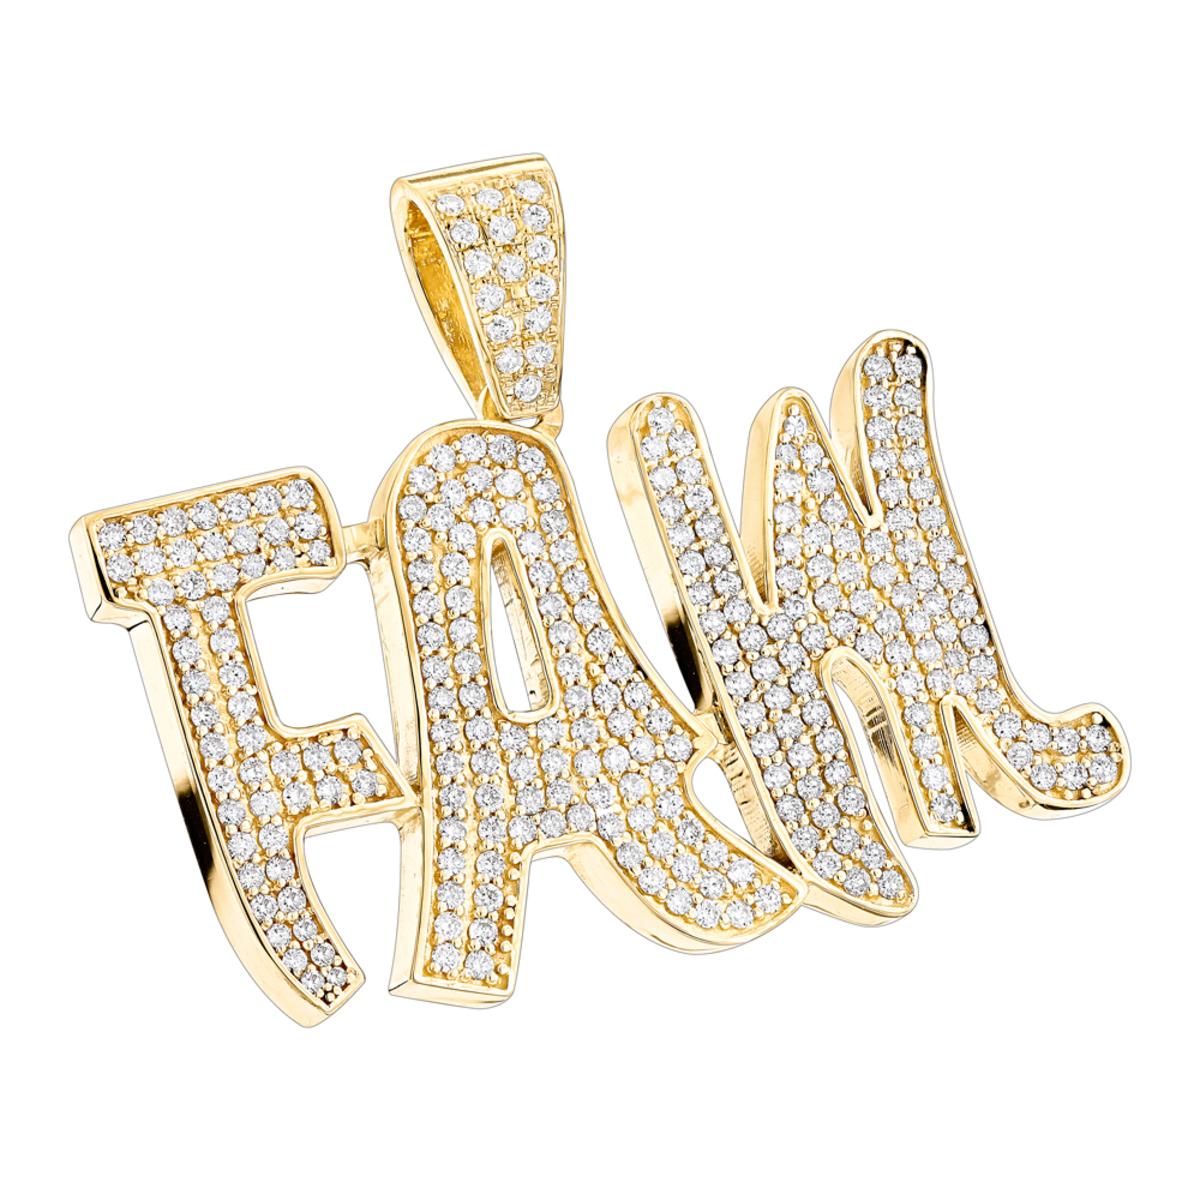 Custom Jewelry! Solid 10K Gold Real Diamond Mens Pendant by Luxurman 3.5ct